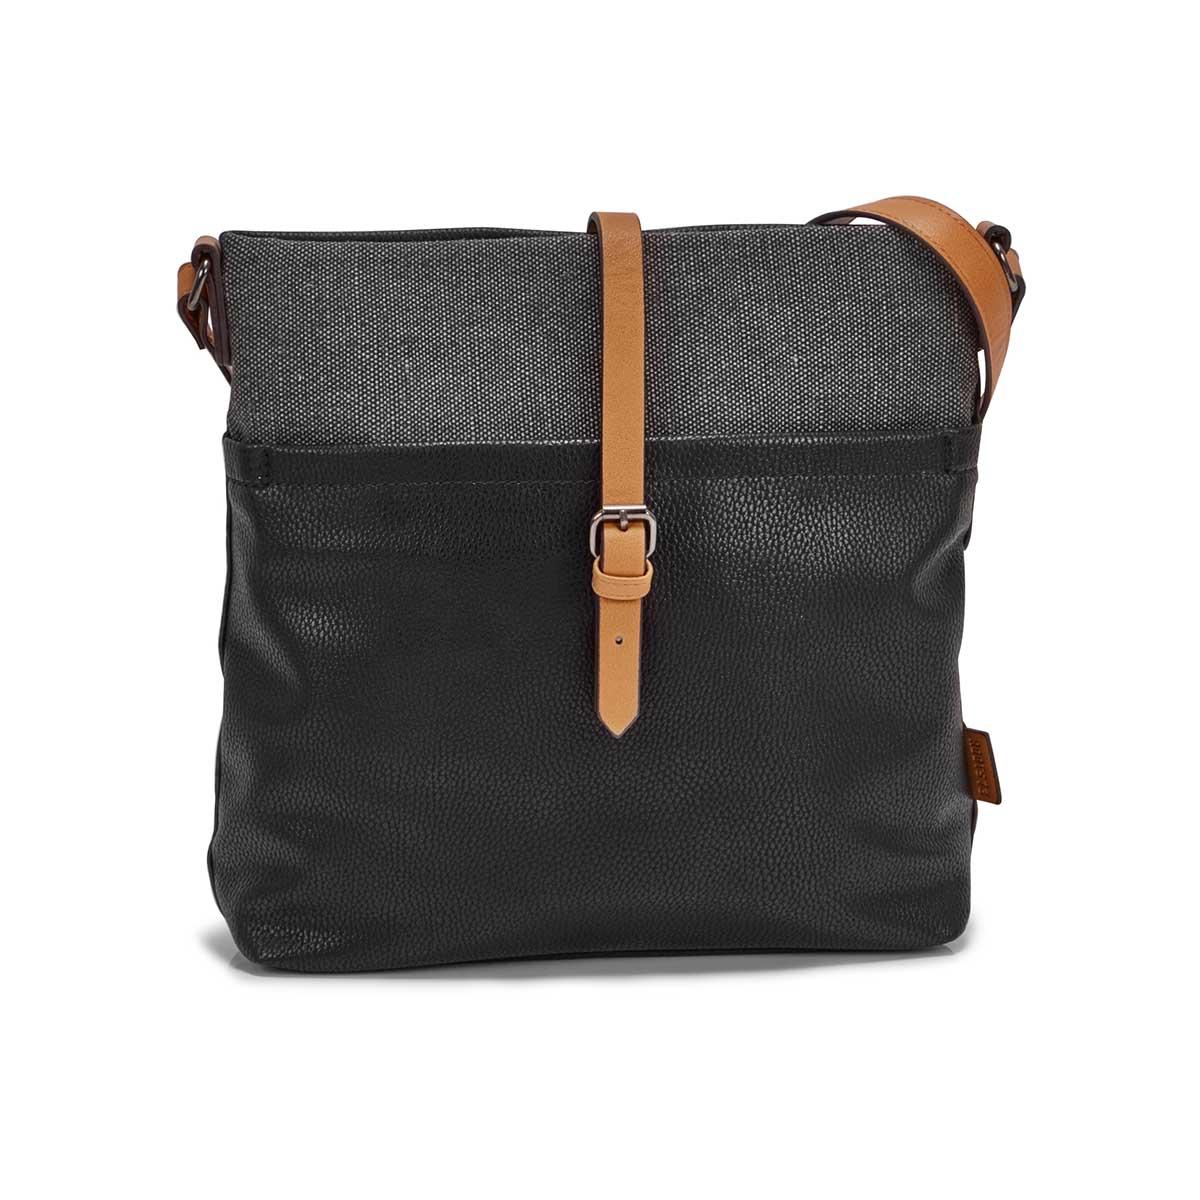 Women's R5530 NORTH/SOUTH black crossbody bag